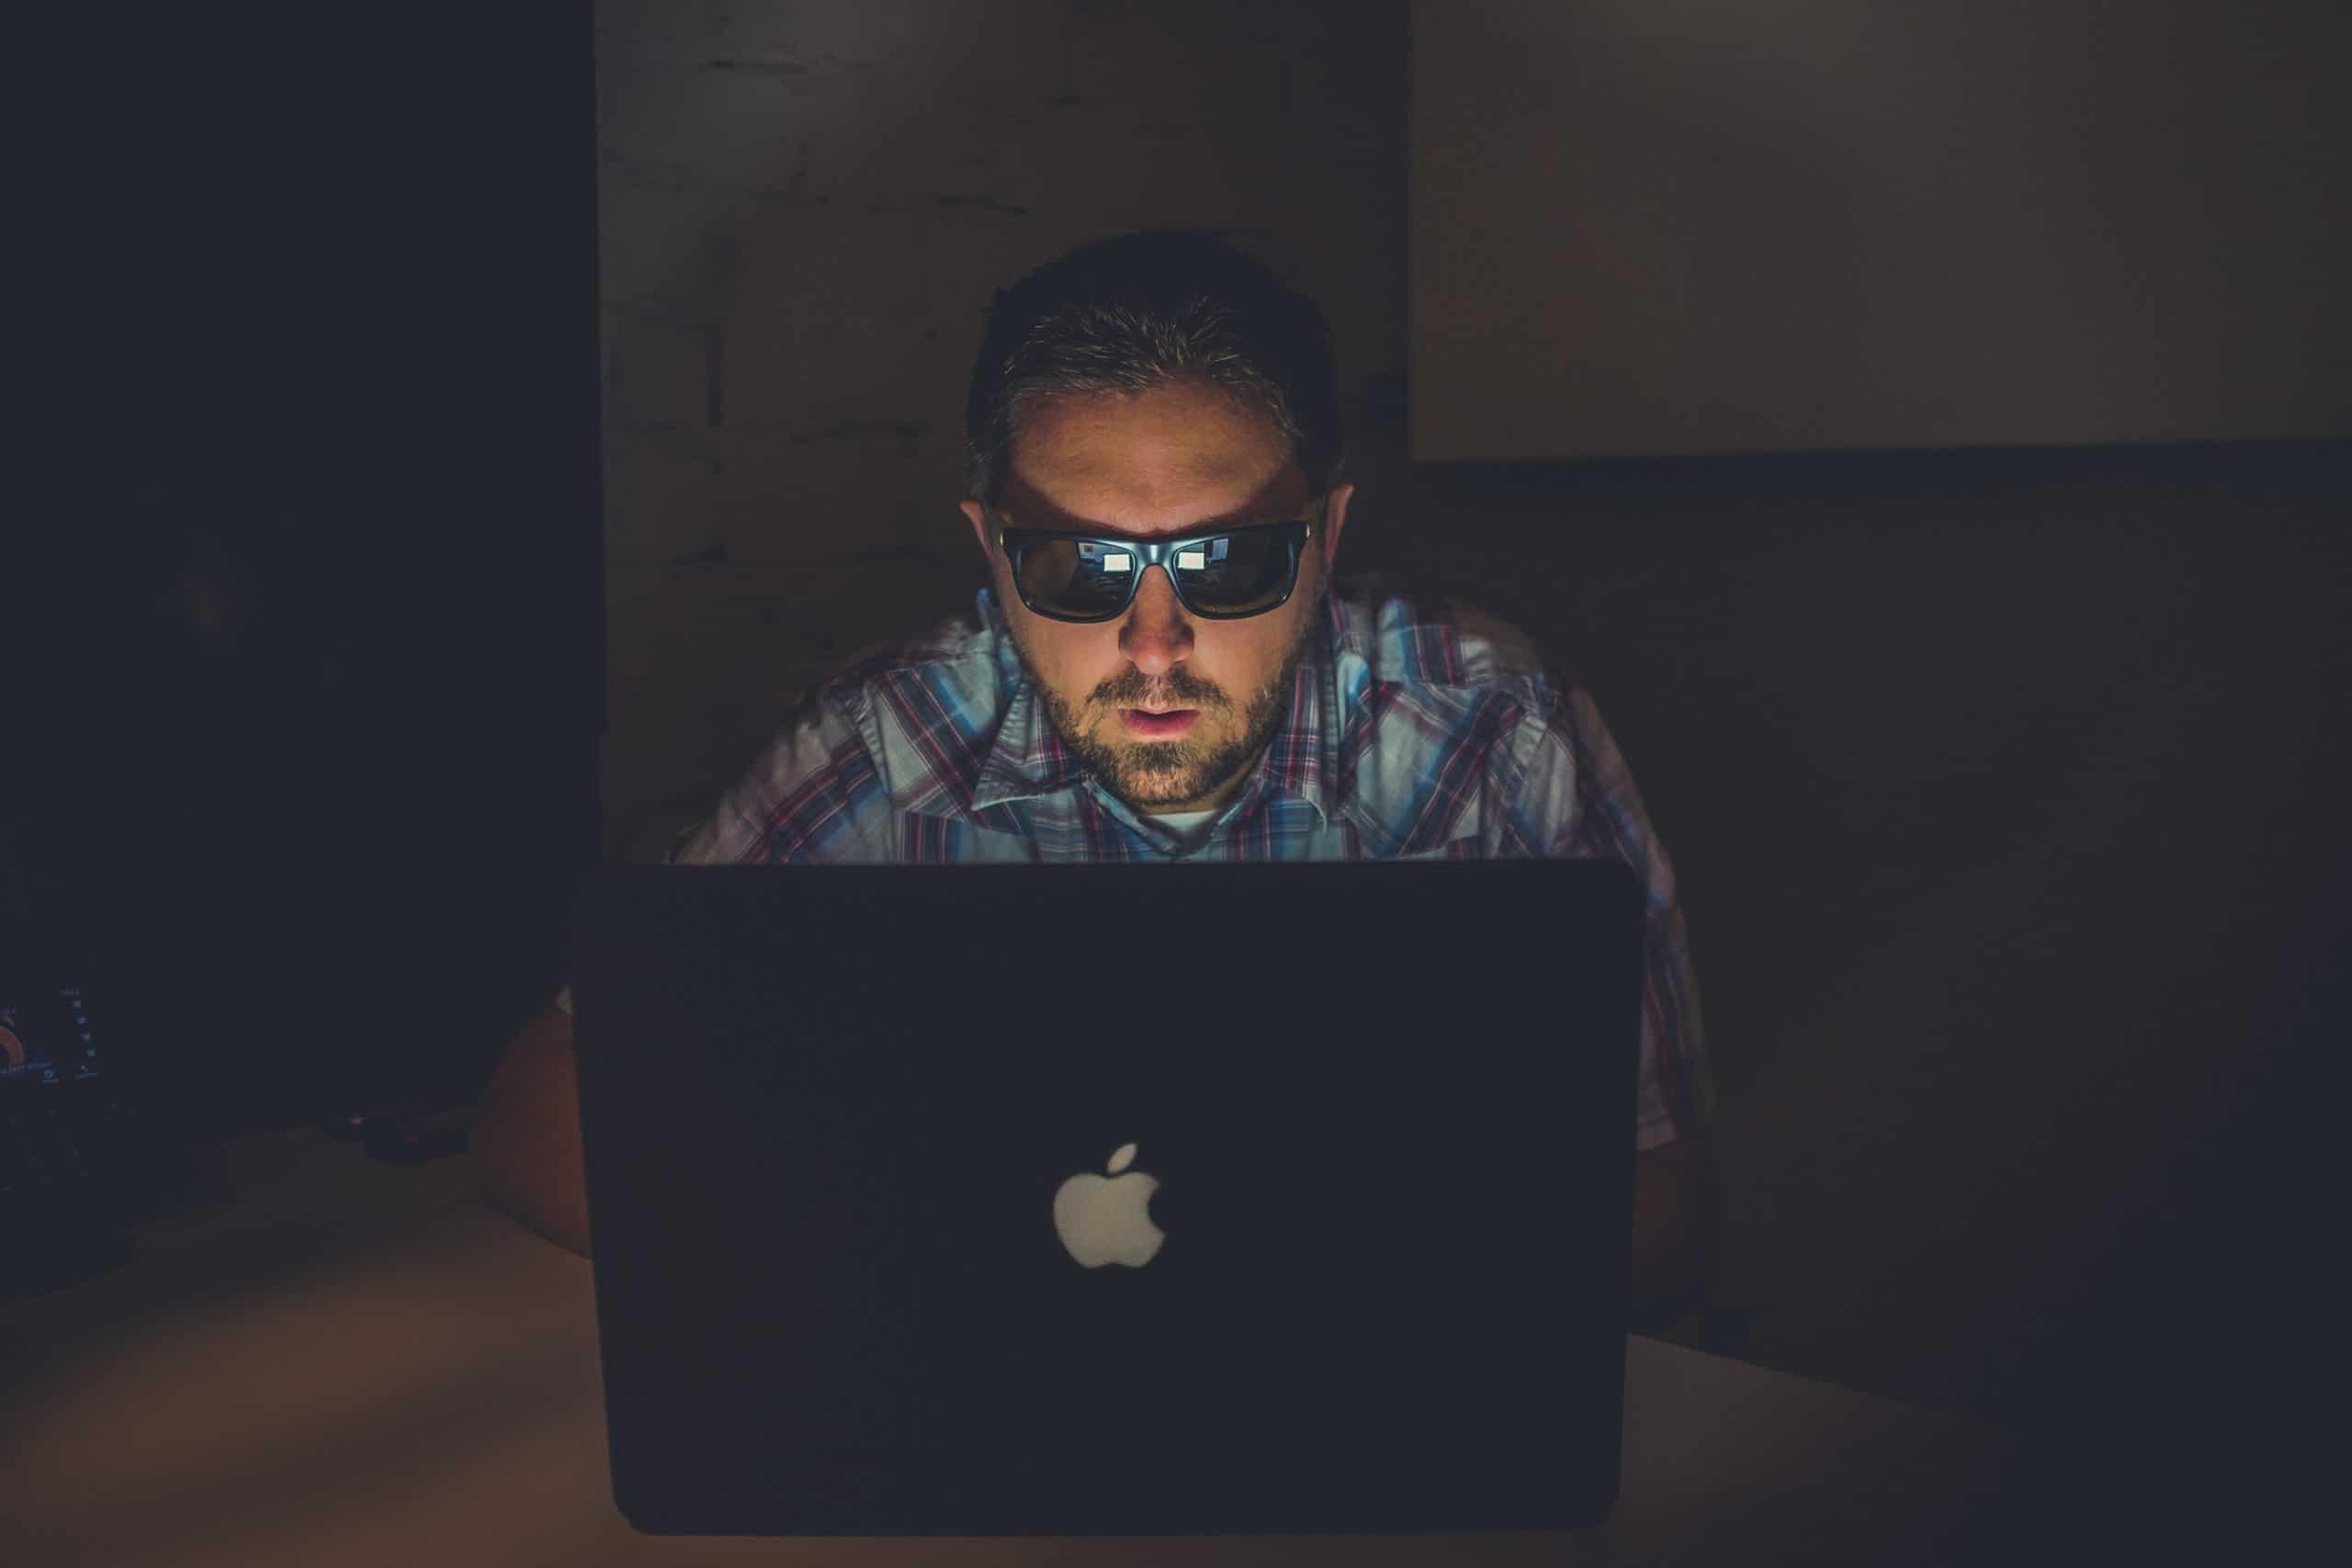 pentest e sicurezza informatica